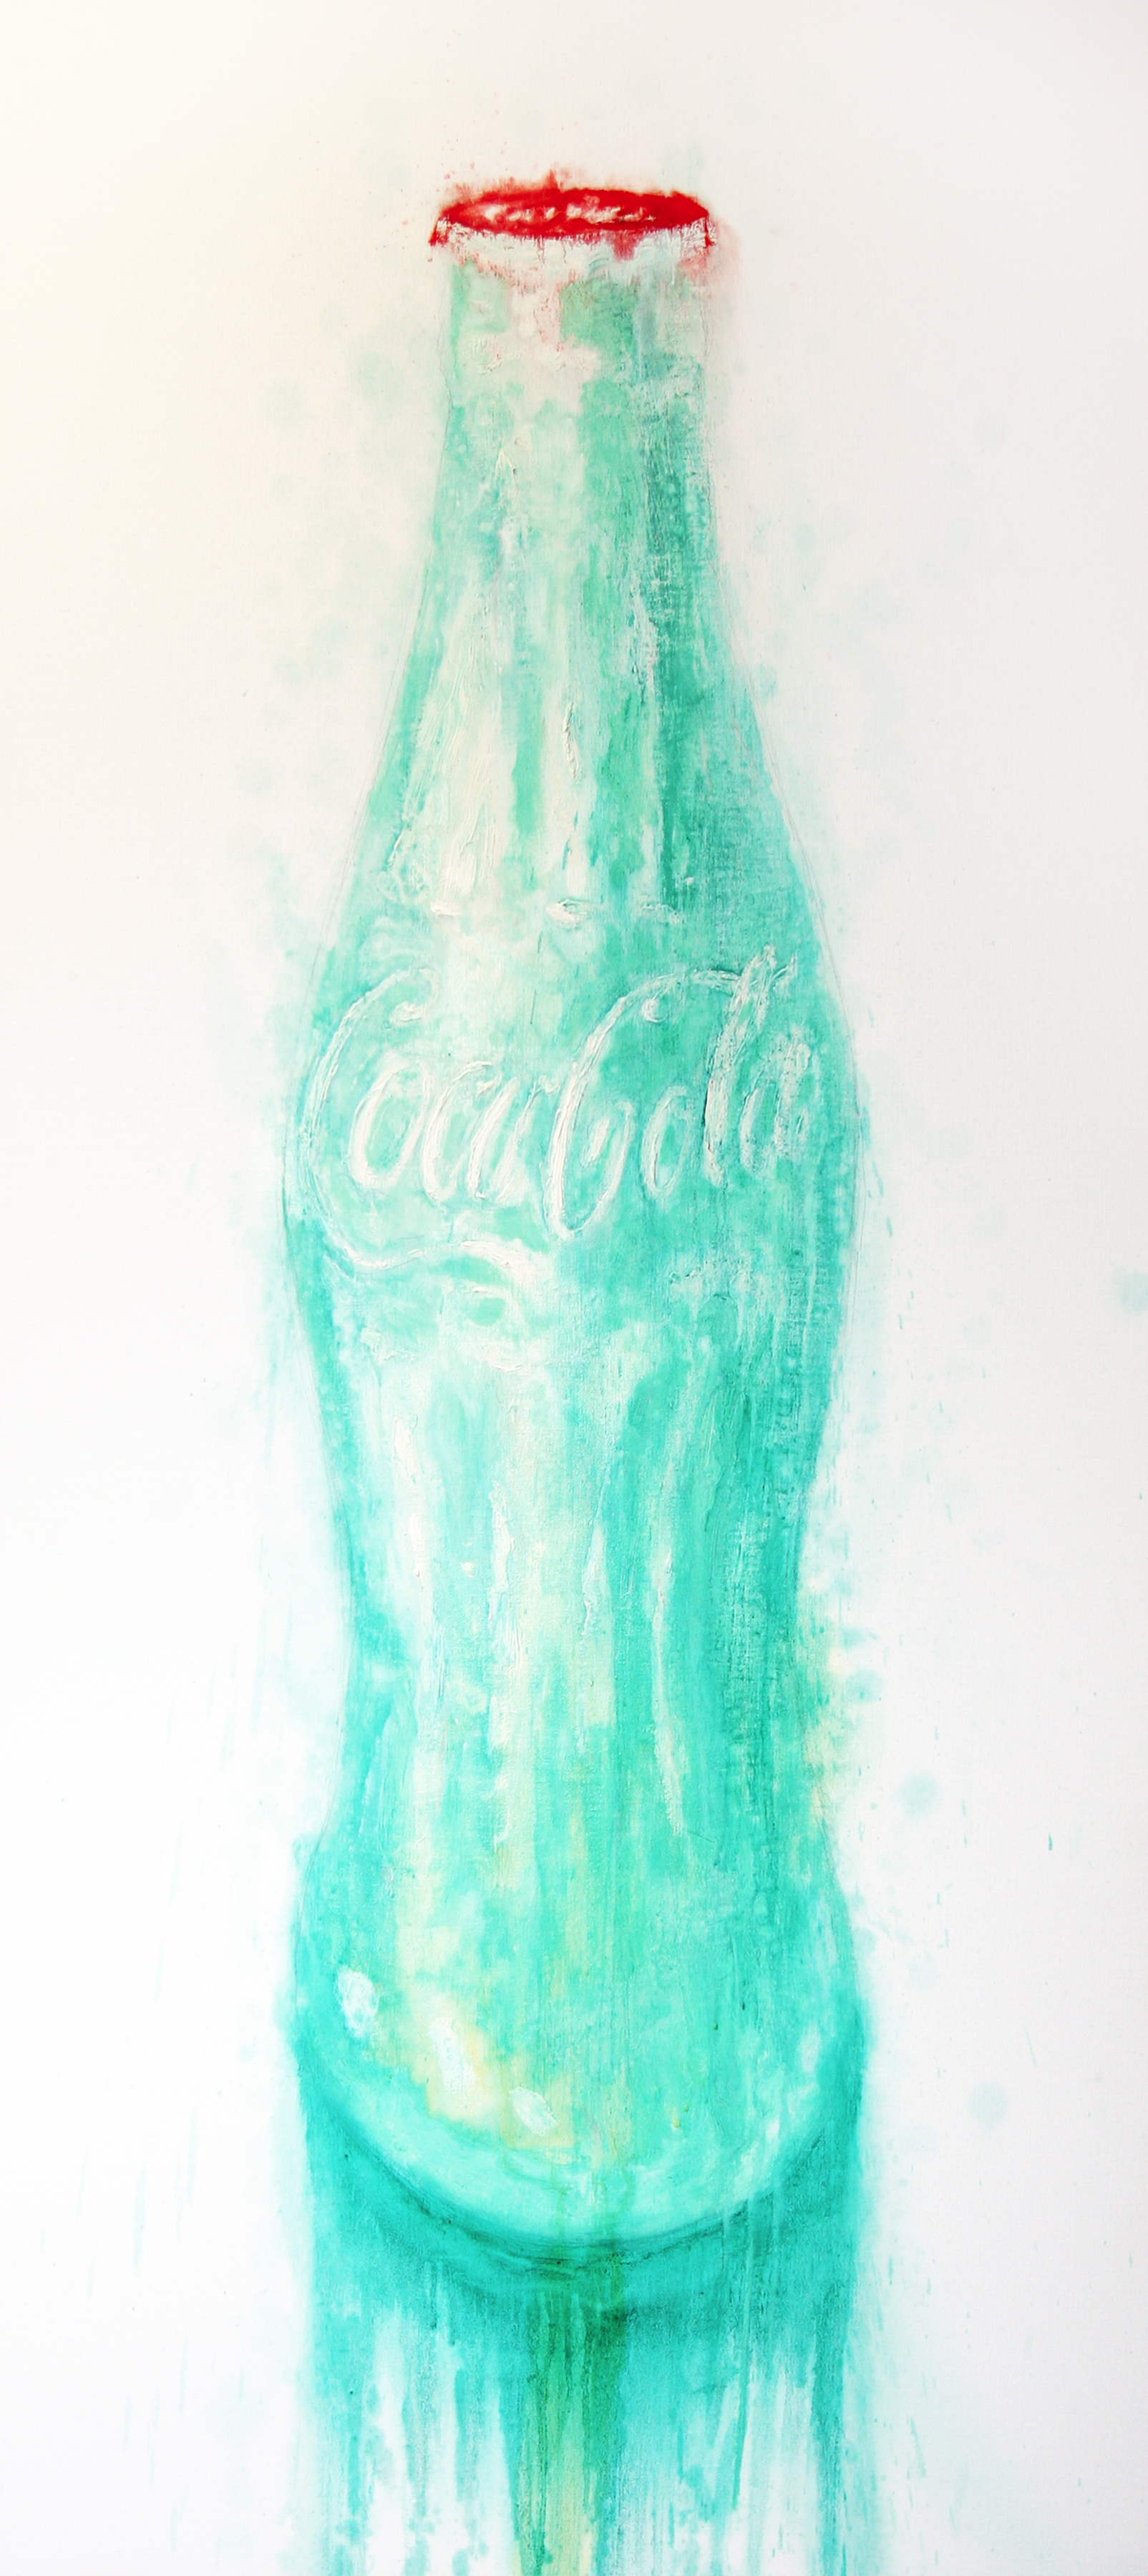 Neil Shawcross_-_Coca-Cola Bottle_acrylic on canvas_198 x 91.5cm.jpg